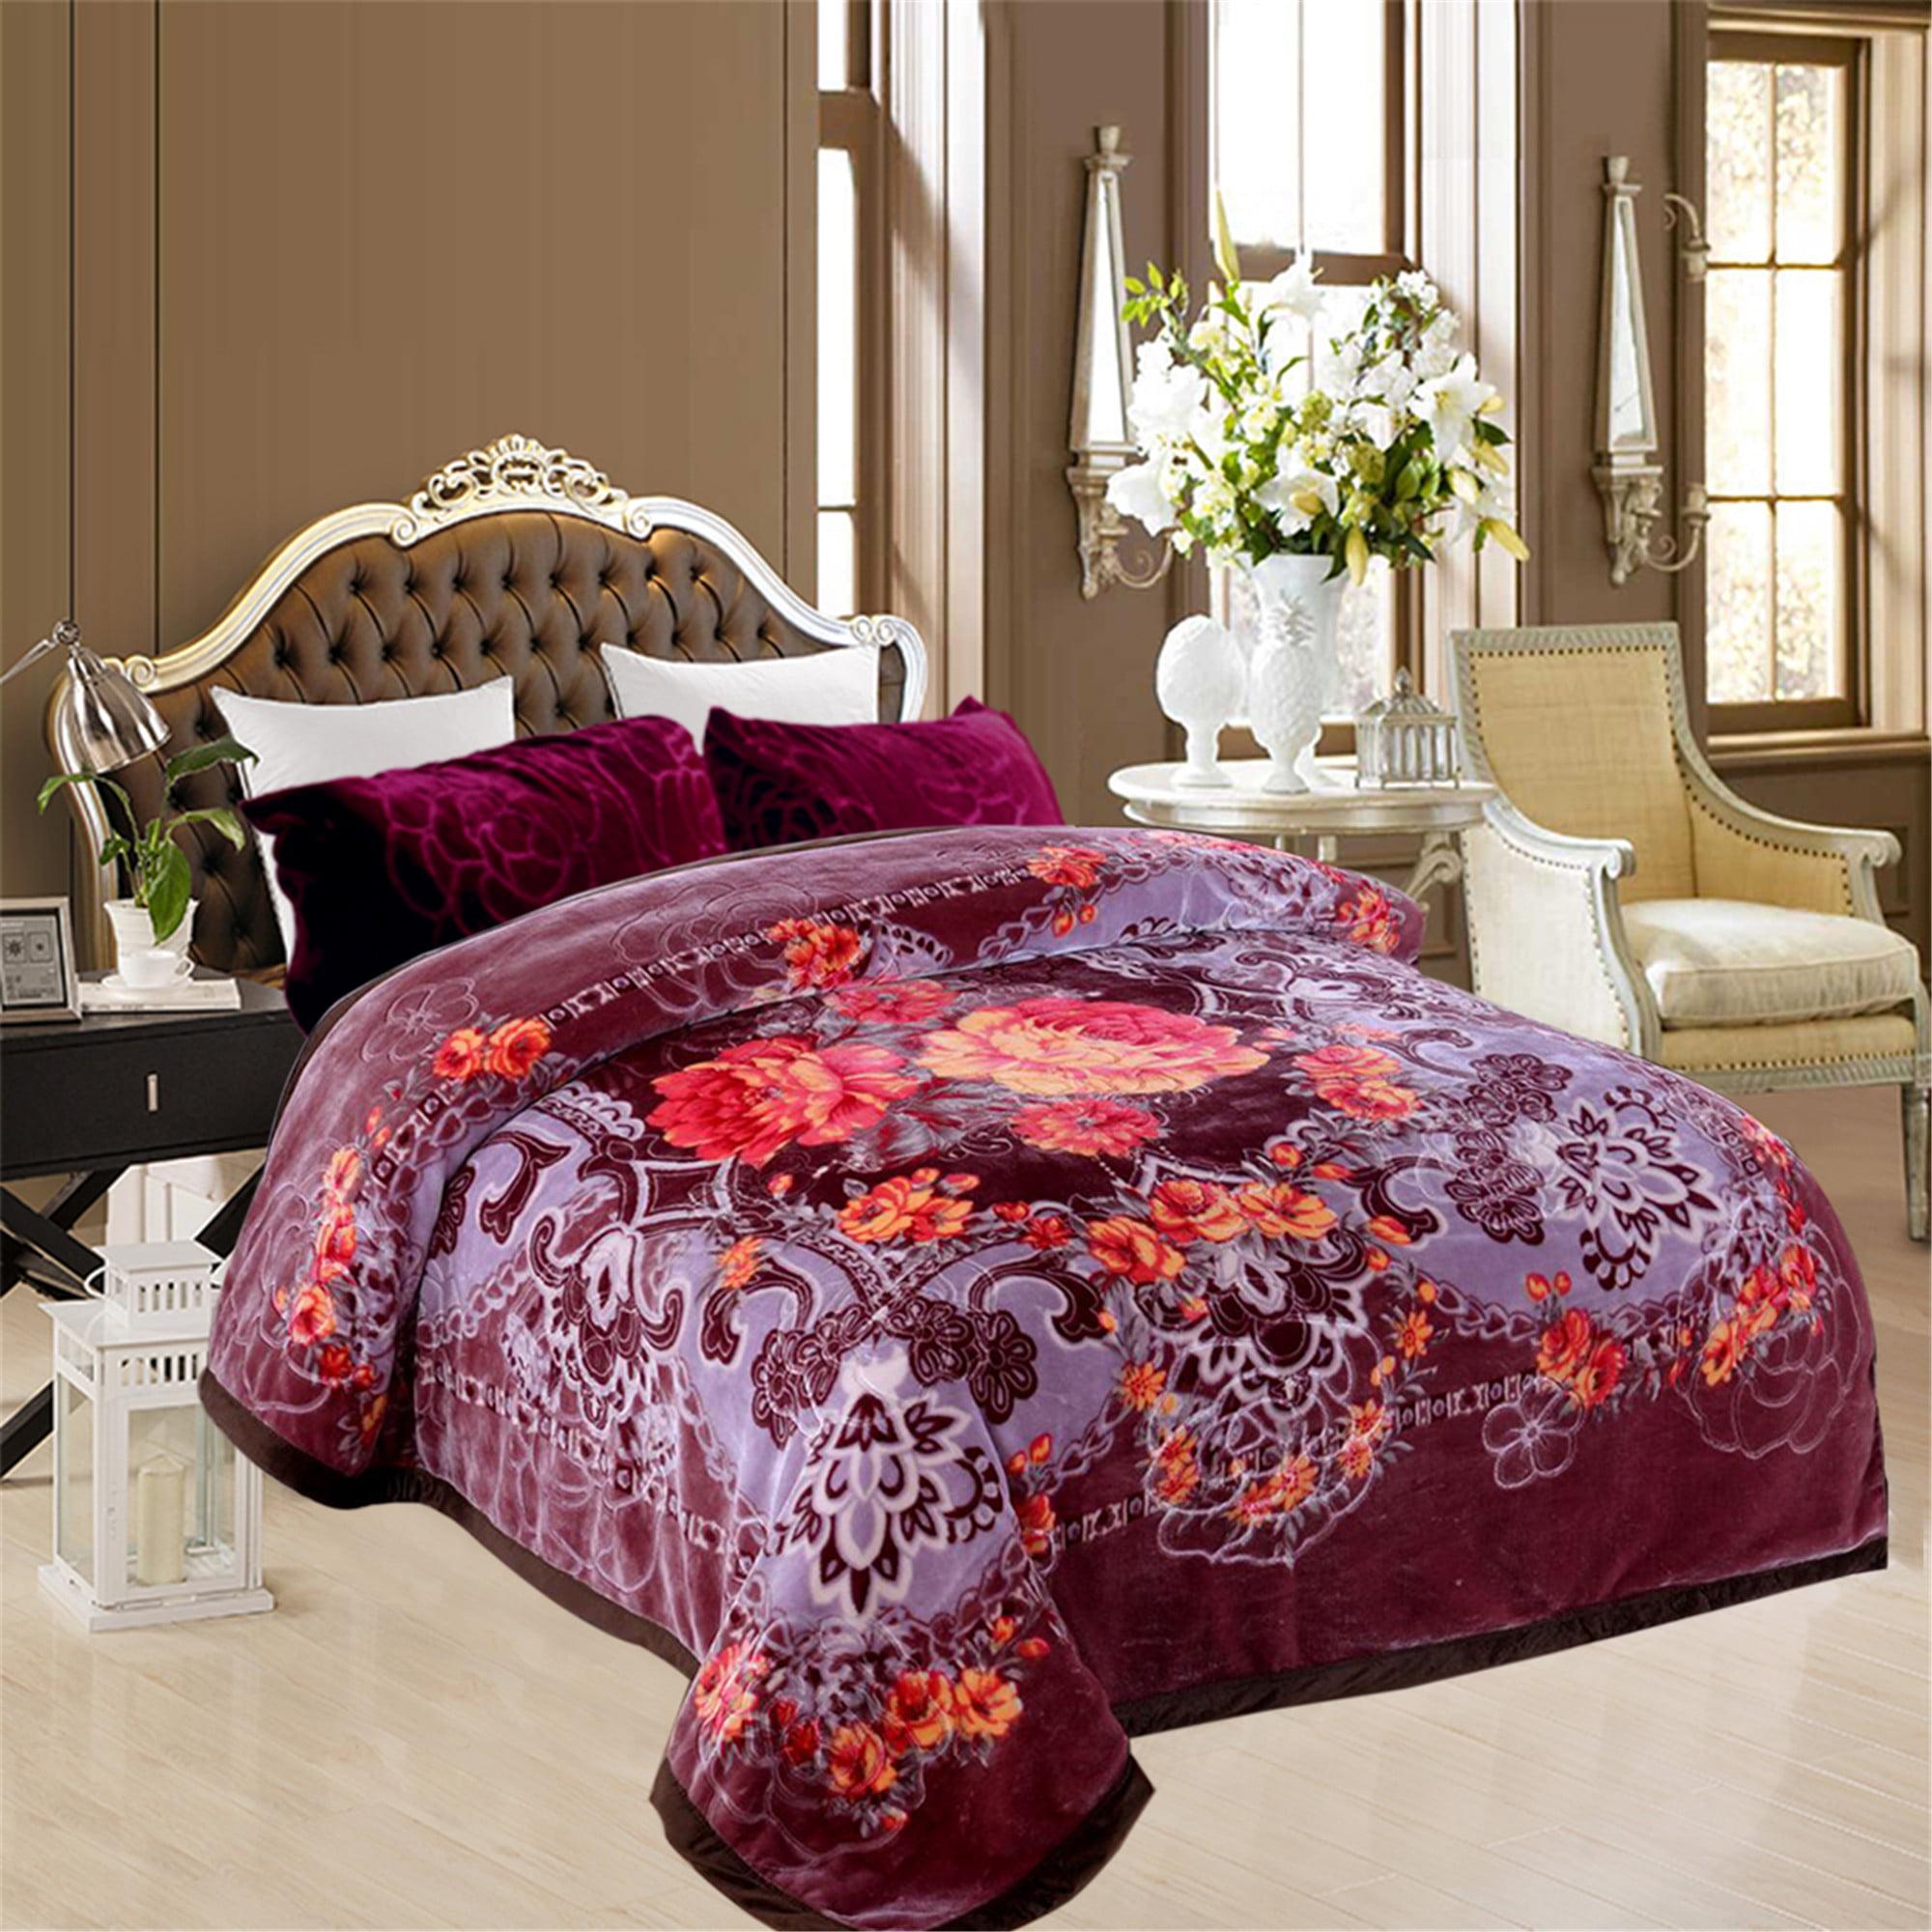 Multipurpose Cozy Warm Mink Blanket For Home Bed 2 Ply Printed Heavy Winter Raschel... by JML